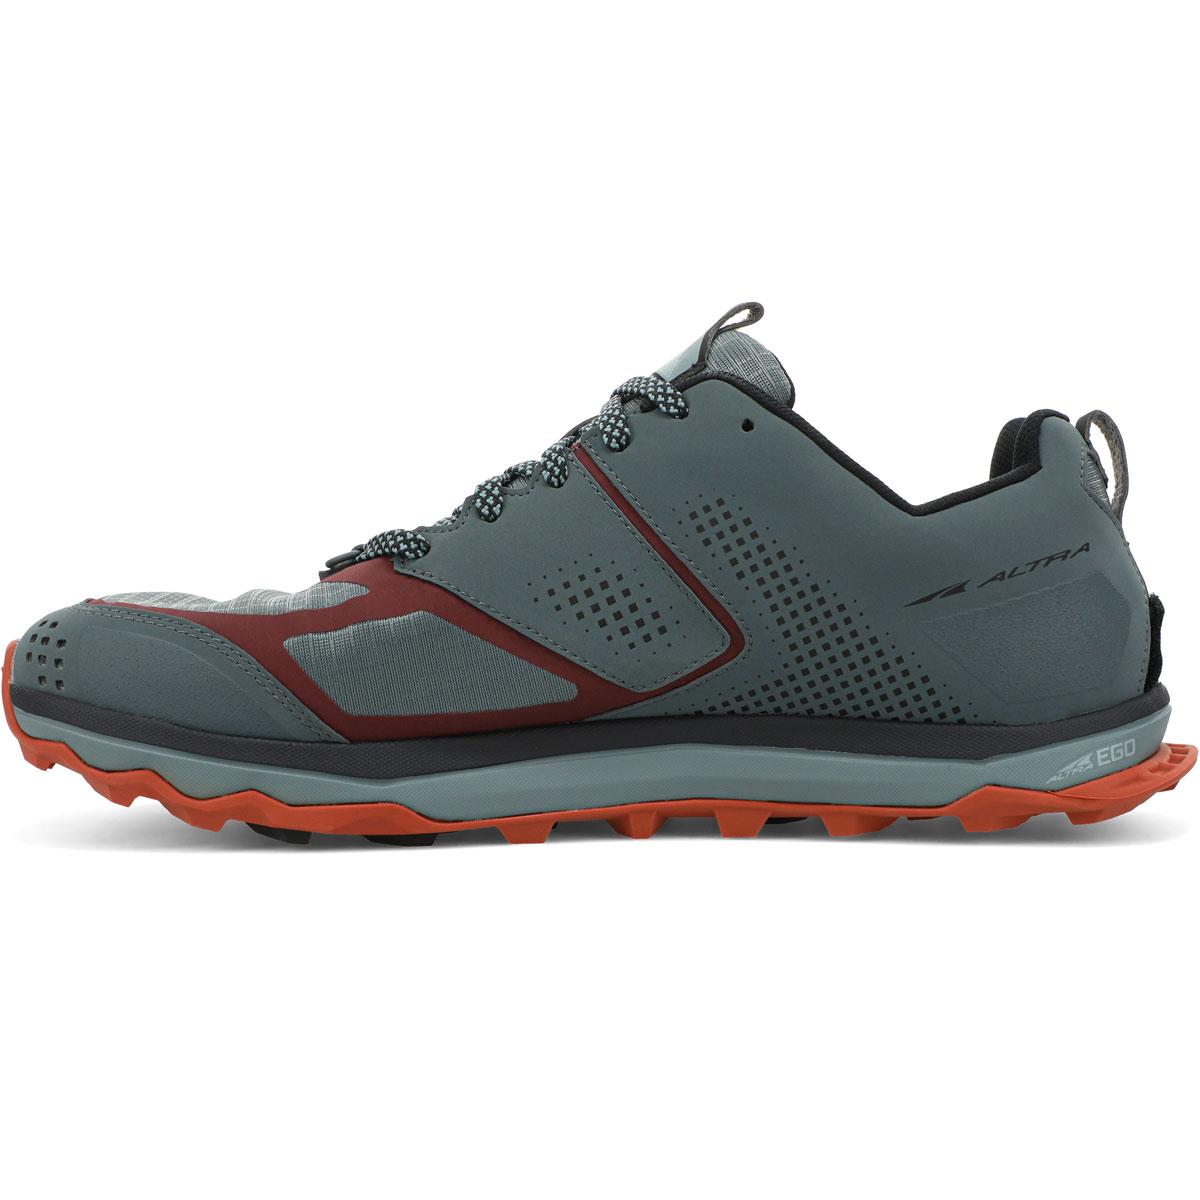 Men's Altra Lone Peak 5 Trail Running Shoe - Color: Gray/Orange - Size: 7 - Width: Regular, Gray/Orange, large, image 2